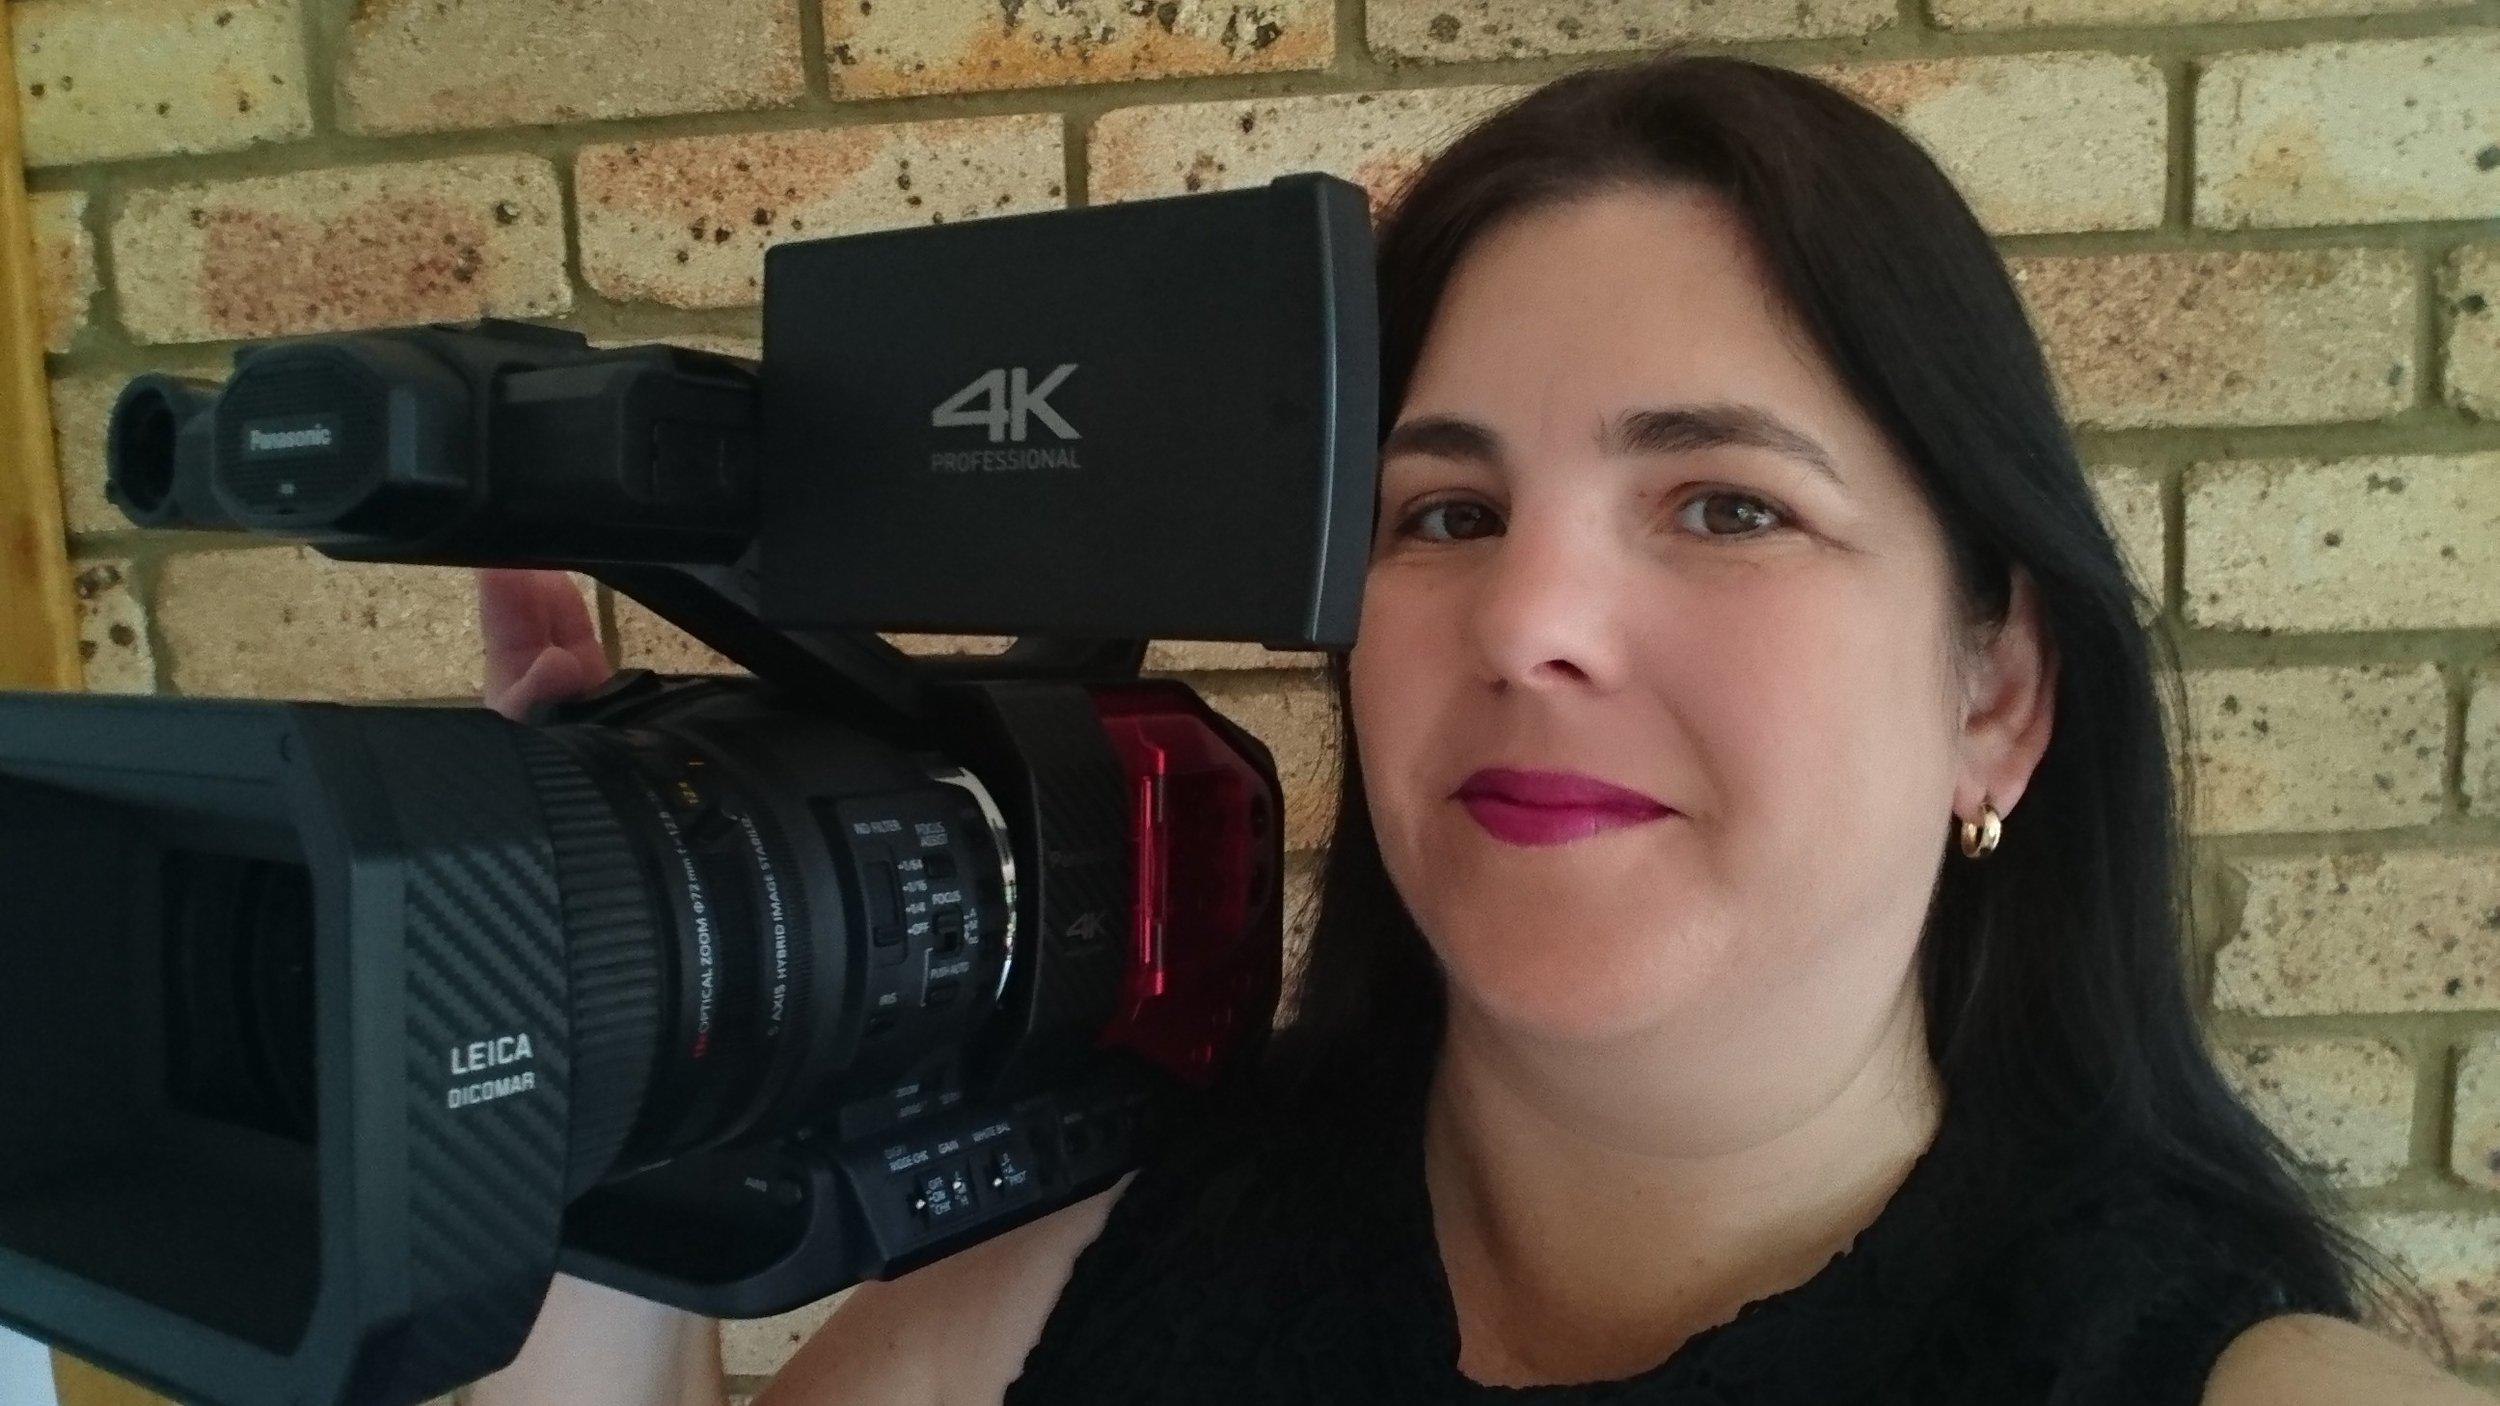 Leonie Kelly Camera.JPG